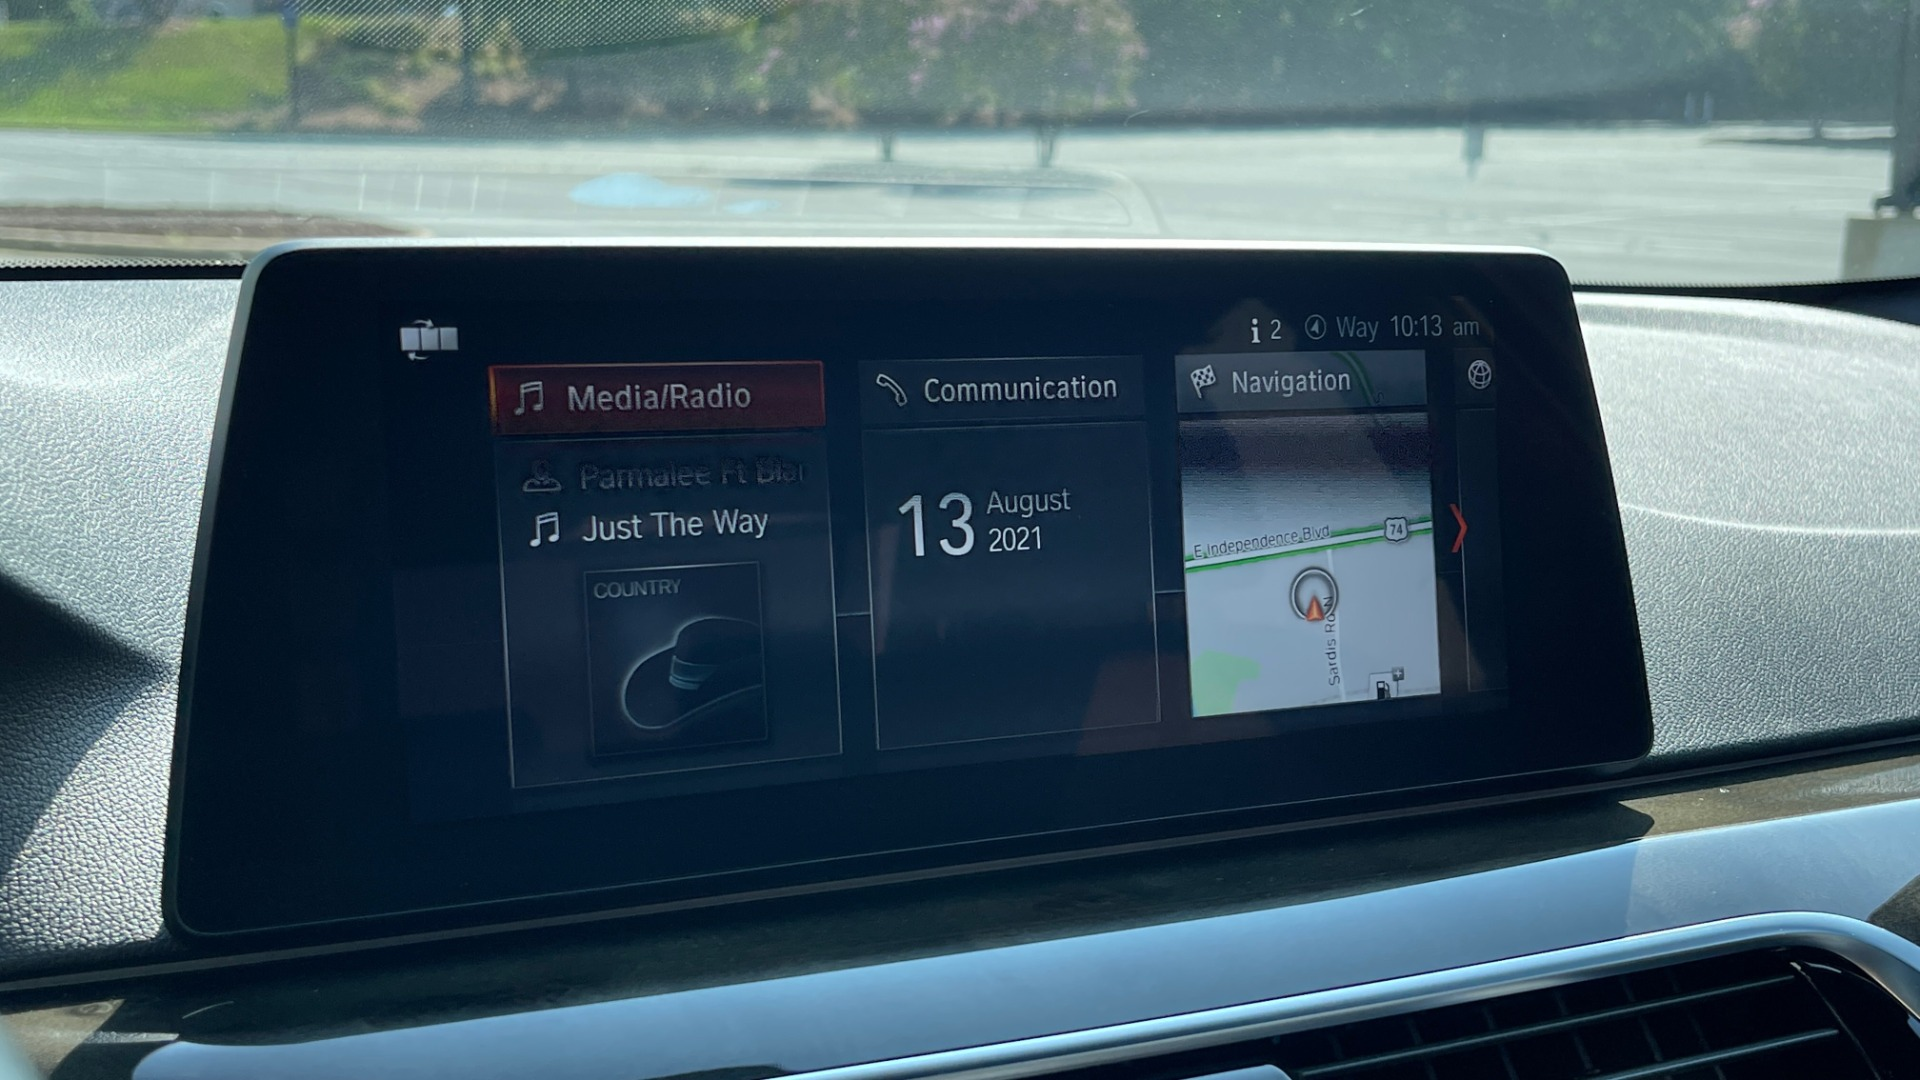 Used 2018 BMW 5 SERIES 540I XDRIVE M-SPORT / DRVR ASST / PDC / APPLE / HUD / H/K SND for sale $42,795 at Formula Imports in Charlotte NC 28227 44